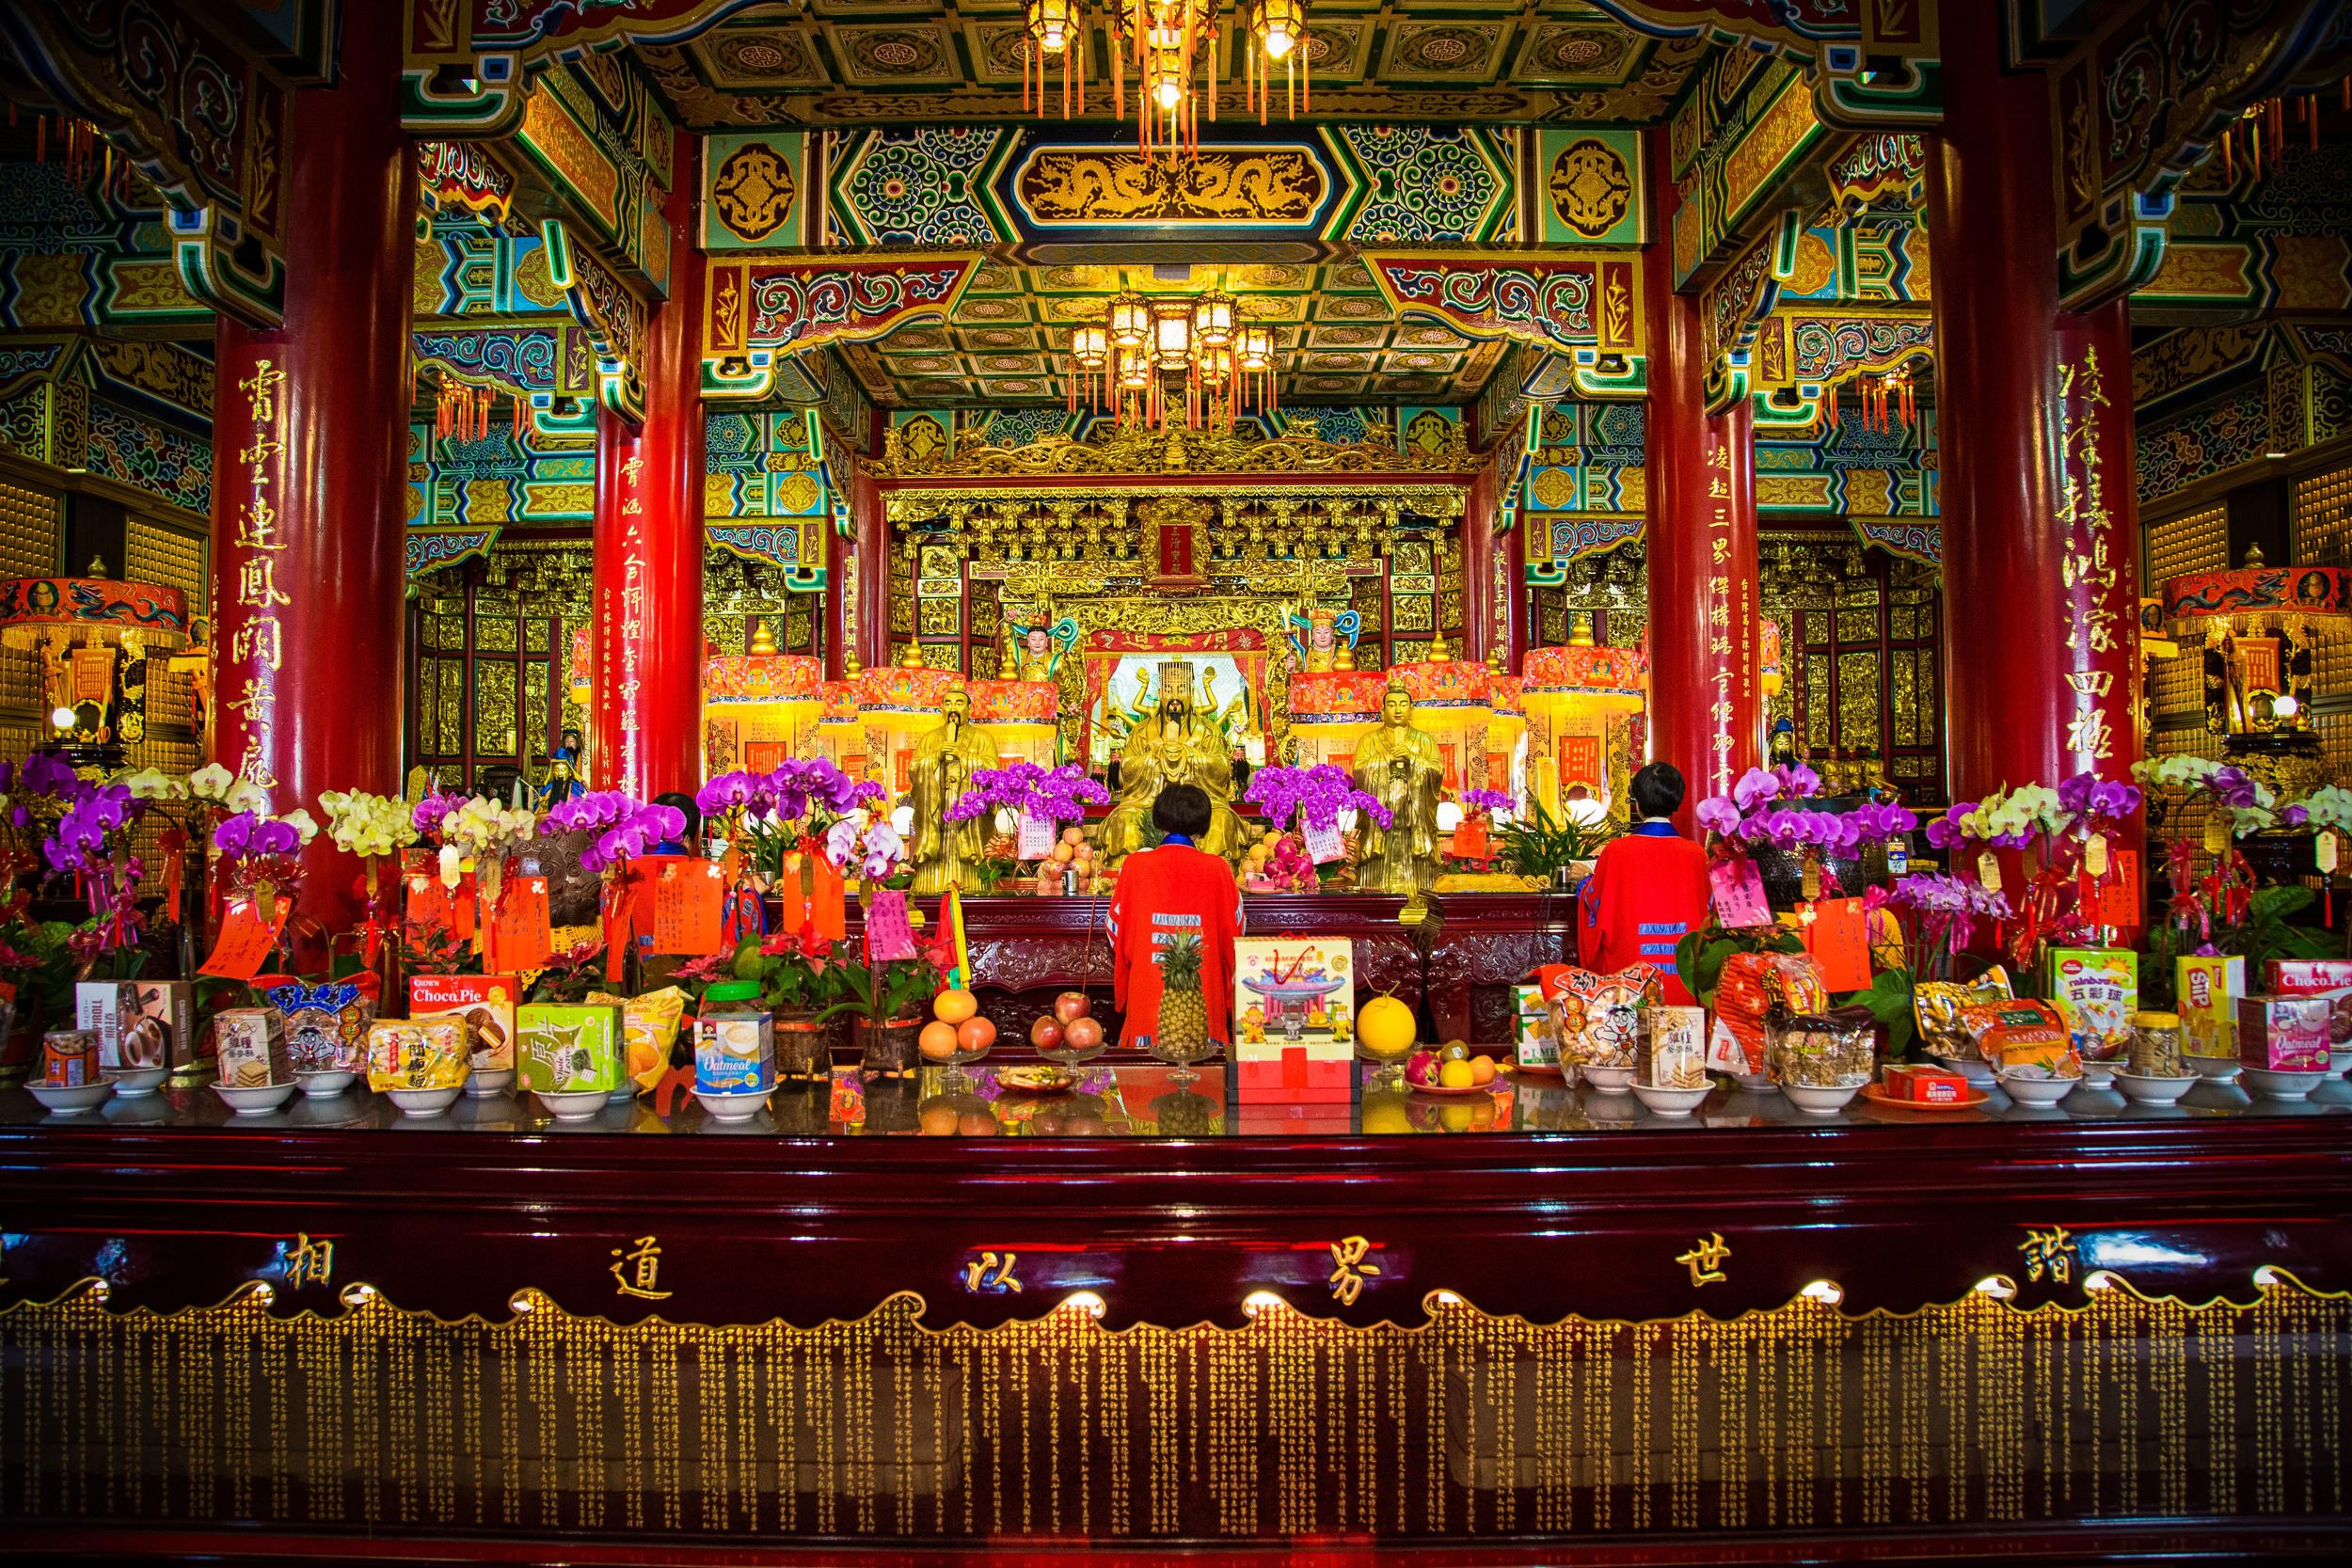 Praying to the statue of Lu Dongbin (呂洞賓)